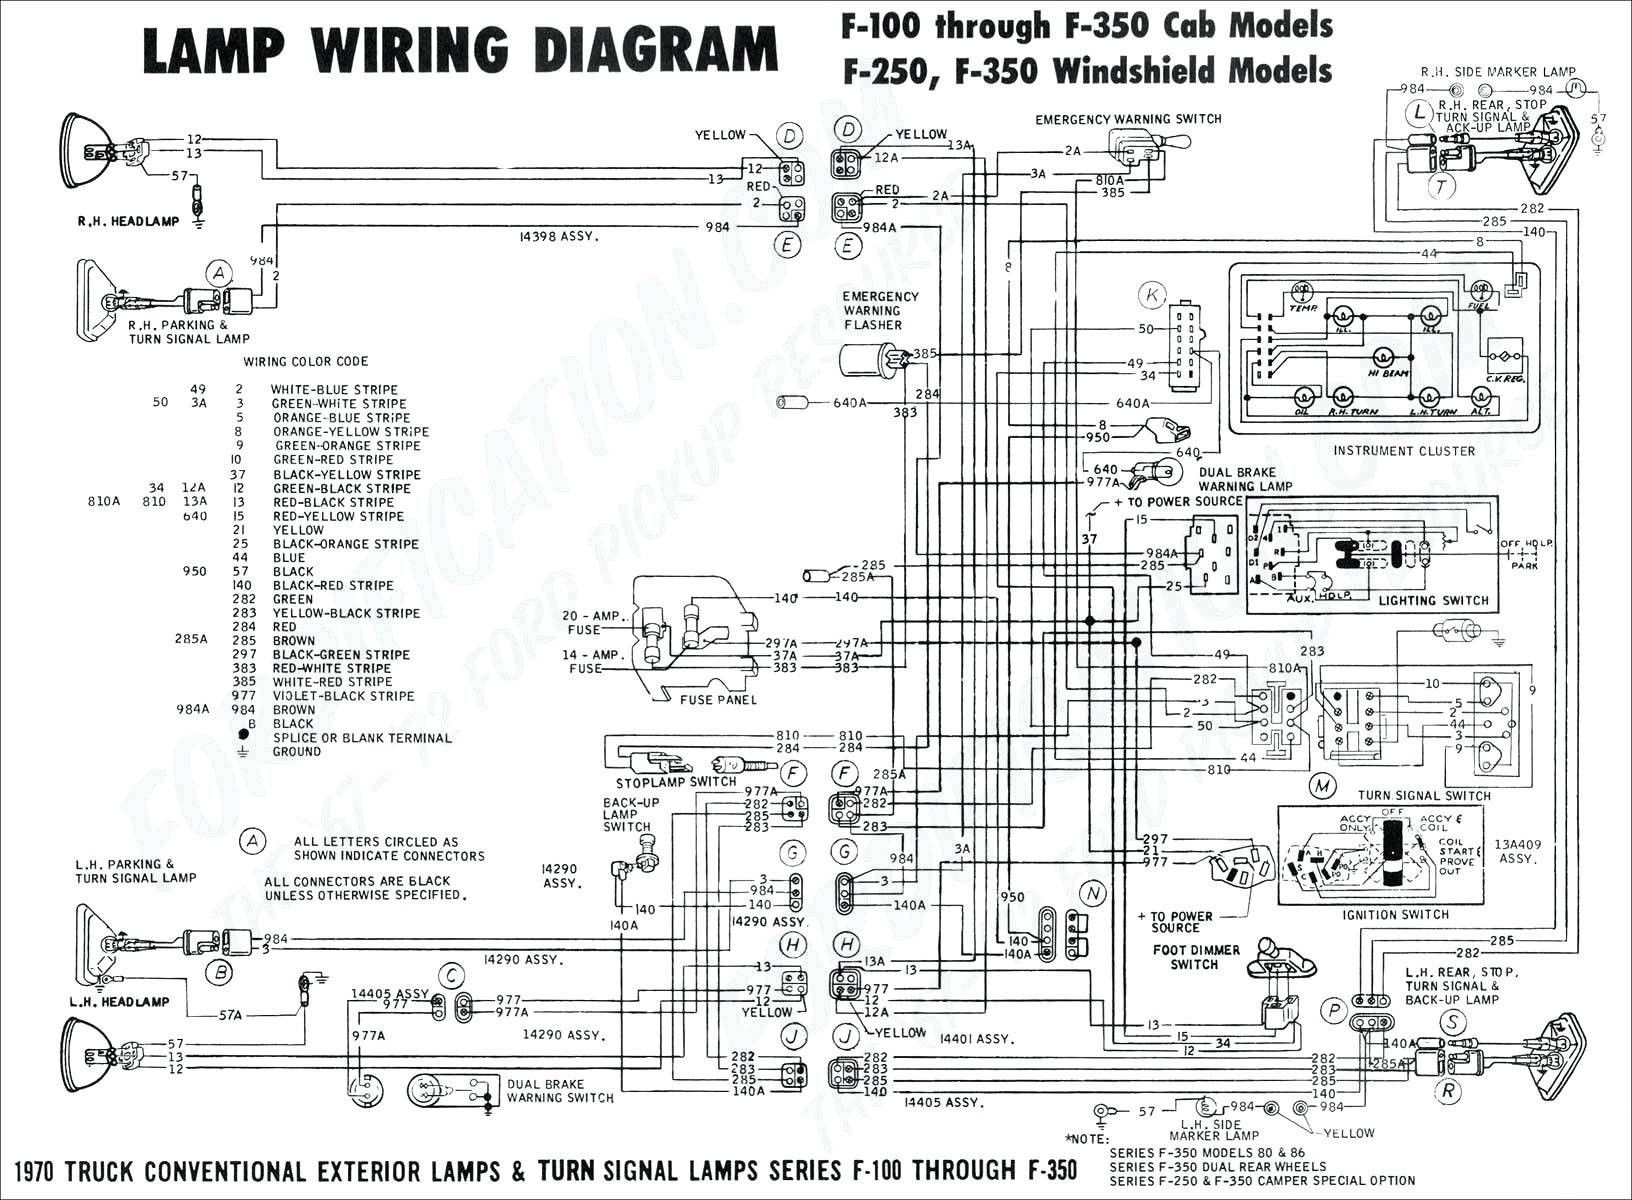 Unique Wiring Diagram Design Sample Free Download Diagrams Digramssample Diagramimages Electrical Diagram Trailer Wiring Diagram Electrical Wiring Diagram